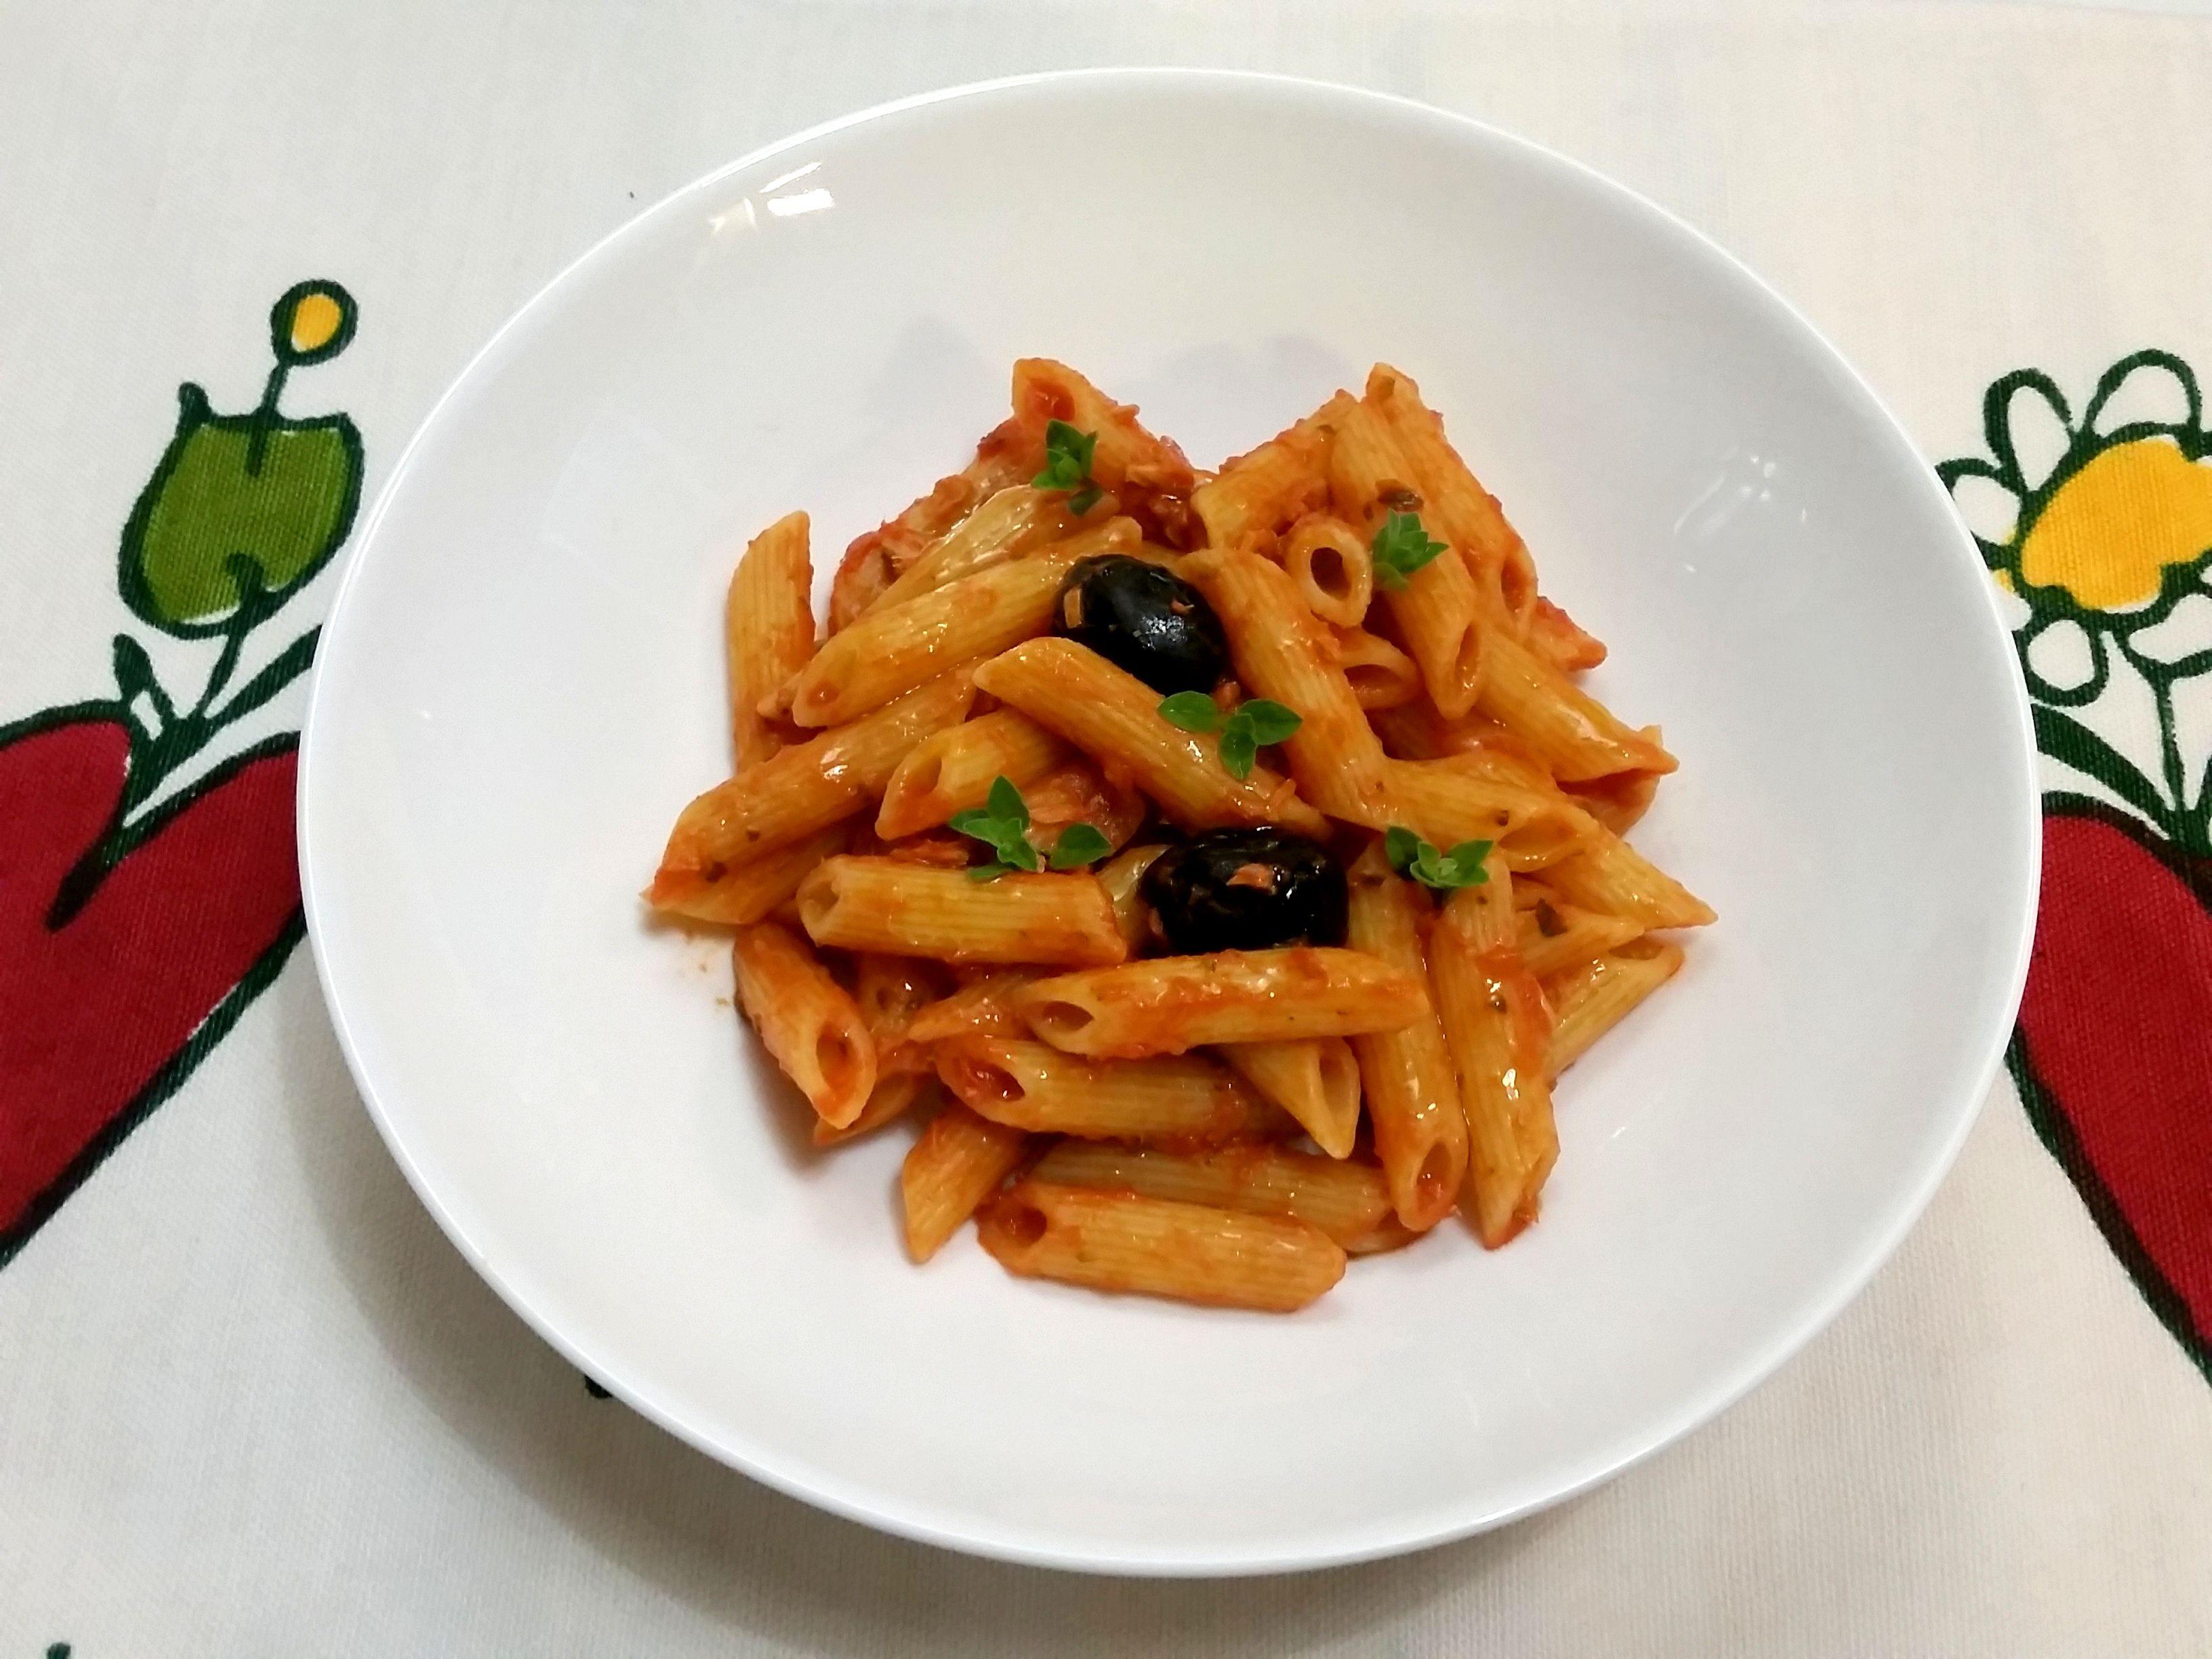 MY VEGAN COMFORT FOOD: PASTA AL POMODORO Almaverdebio OLIVE E ORIGANO http://www.bettinaincucina.com/2016/05/my-vegan-comfort-food/